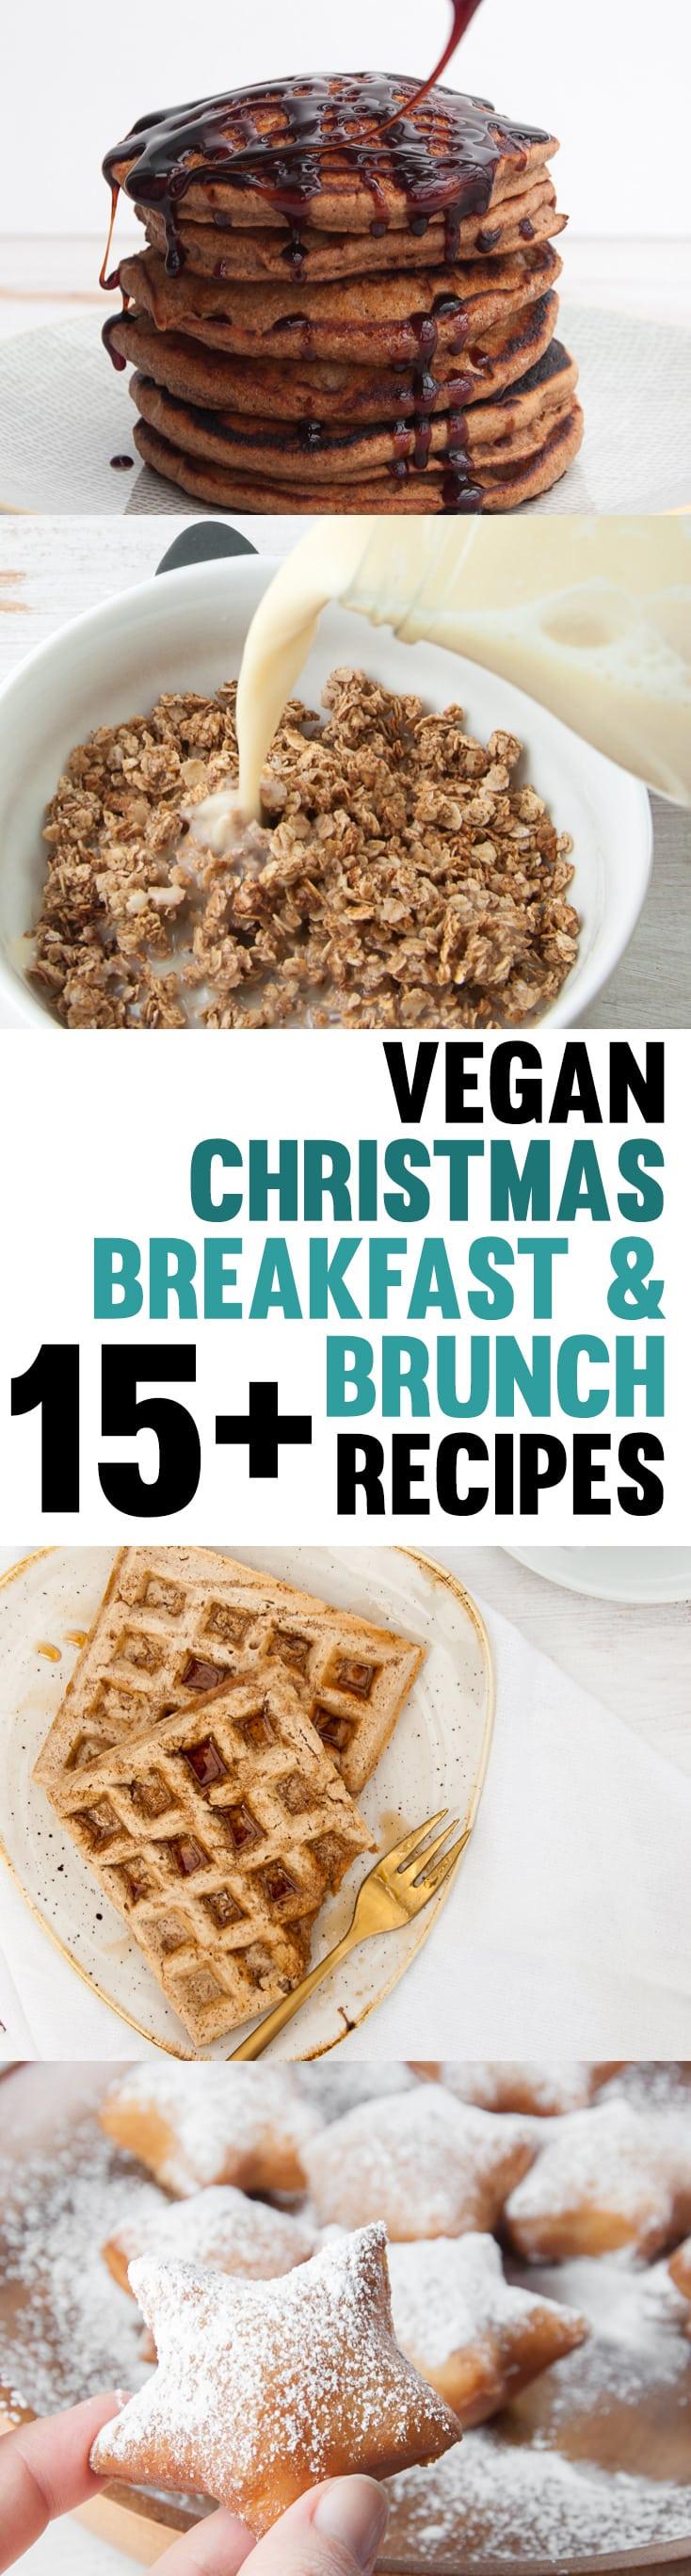 15+ Vegan Christmas Breakfast and Brunch Recipes #vegan #christmas #breakfast #brunch #festive | ElephantasticVegan.com